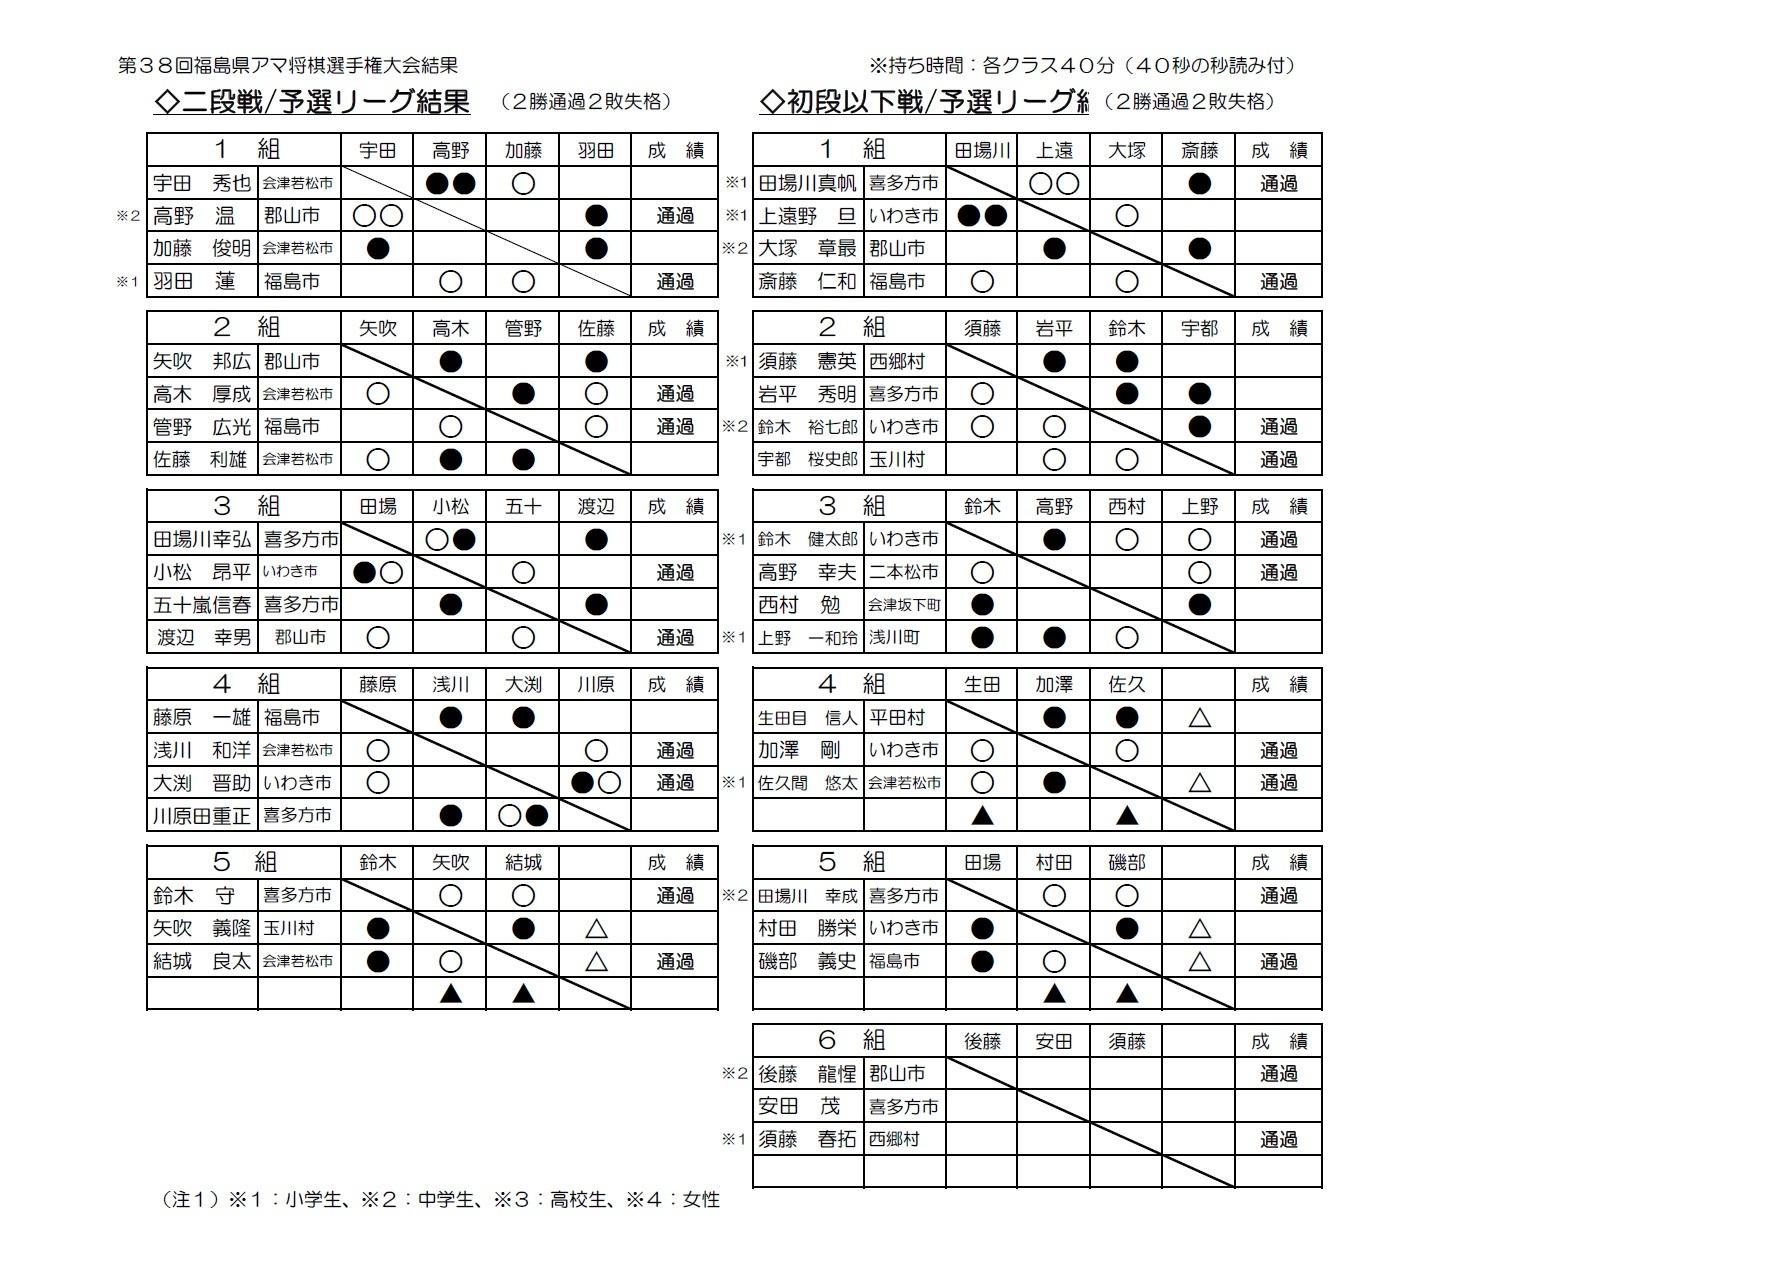 yosen_2_20181111.jpg